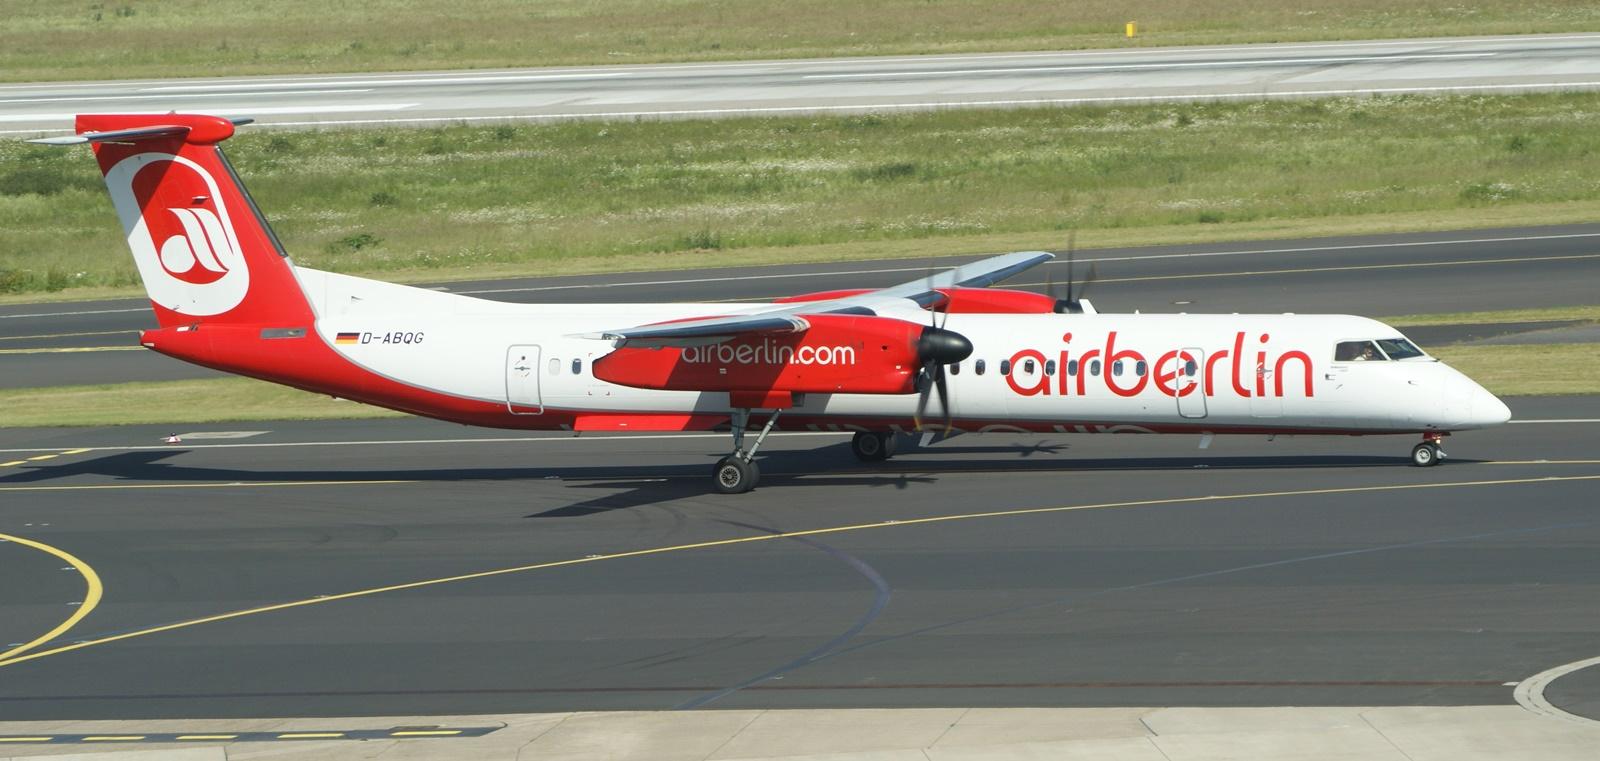 Bombardier Q400 D-ABQG Air Berlin